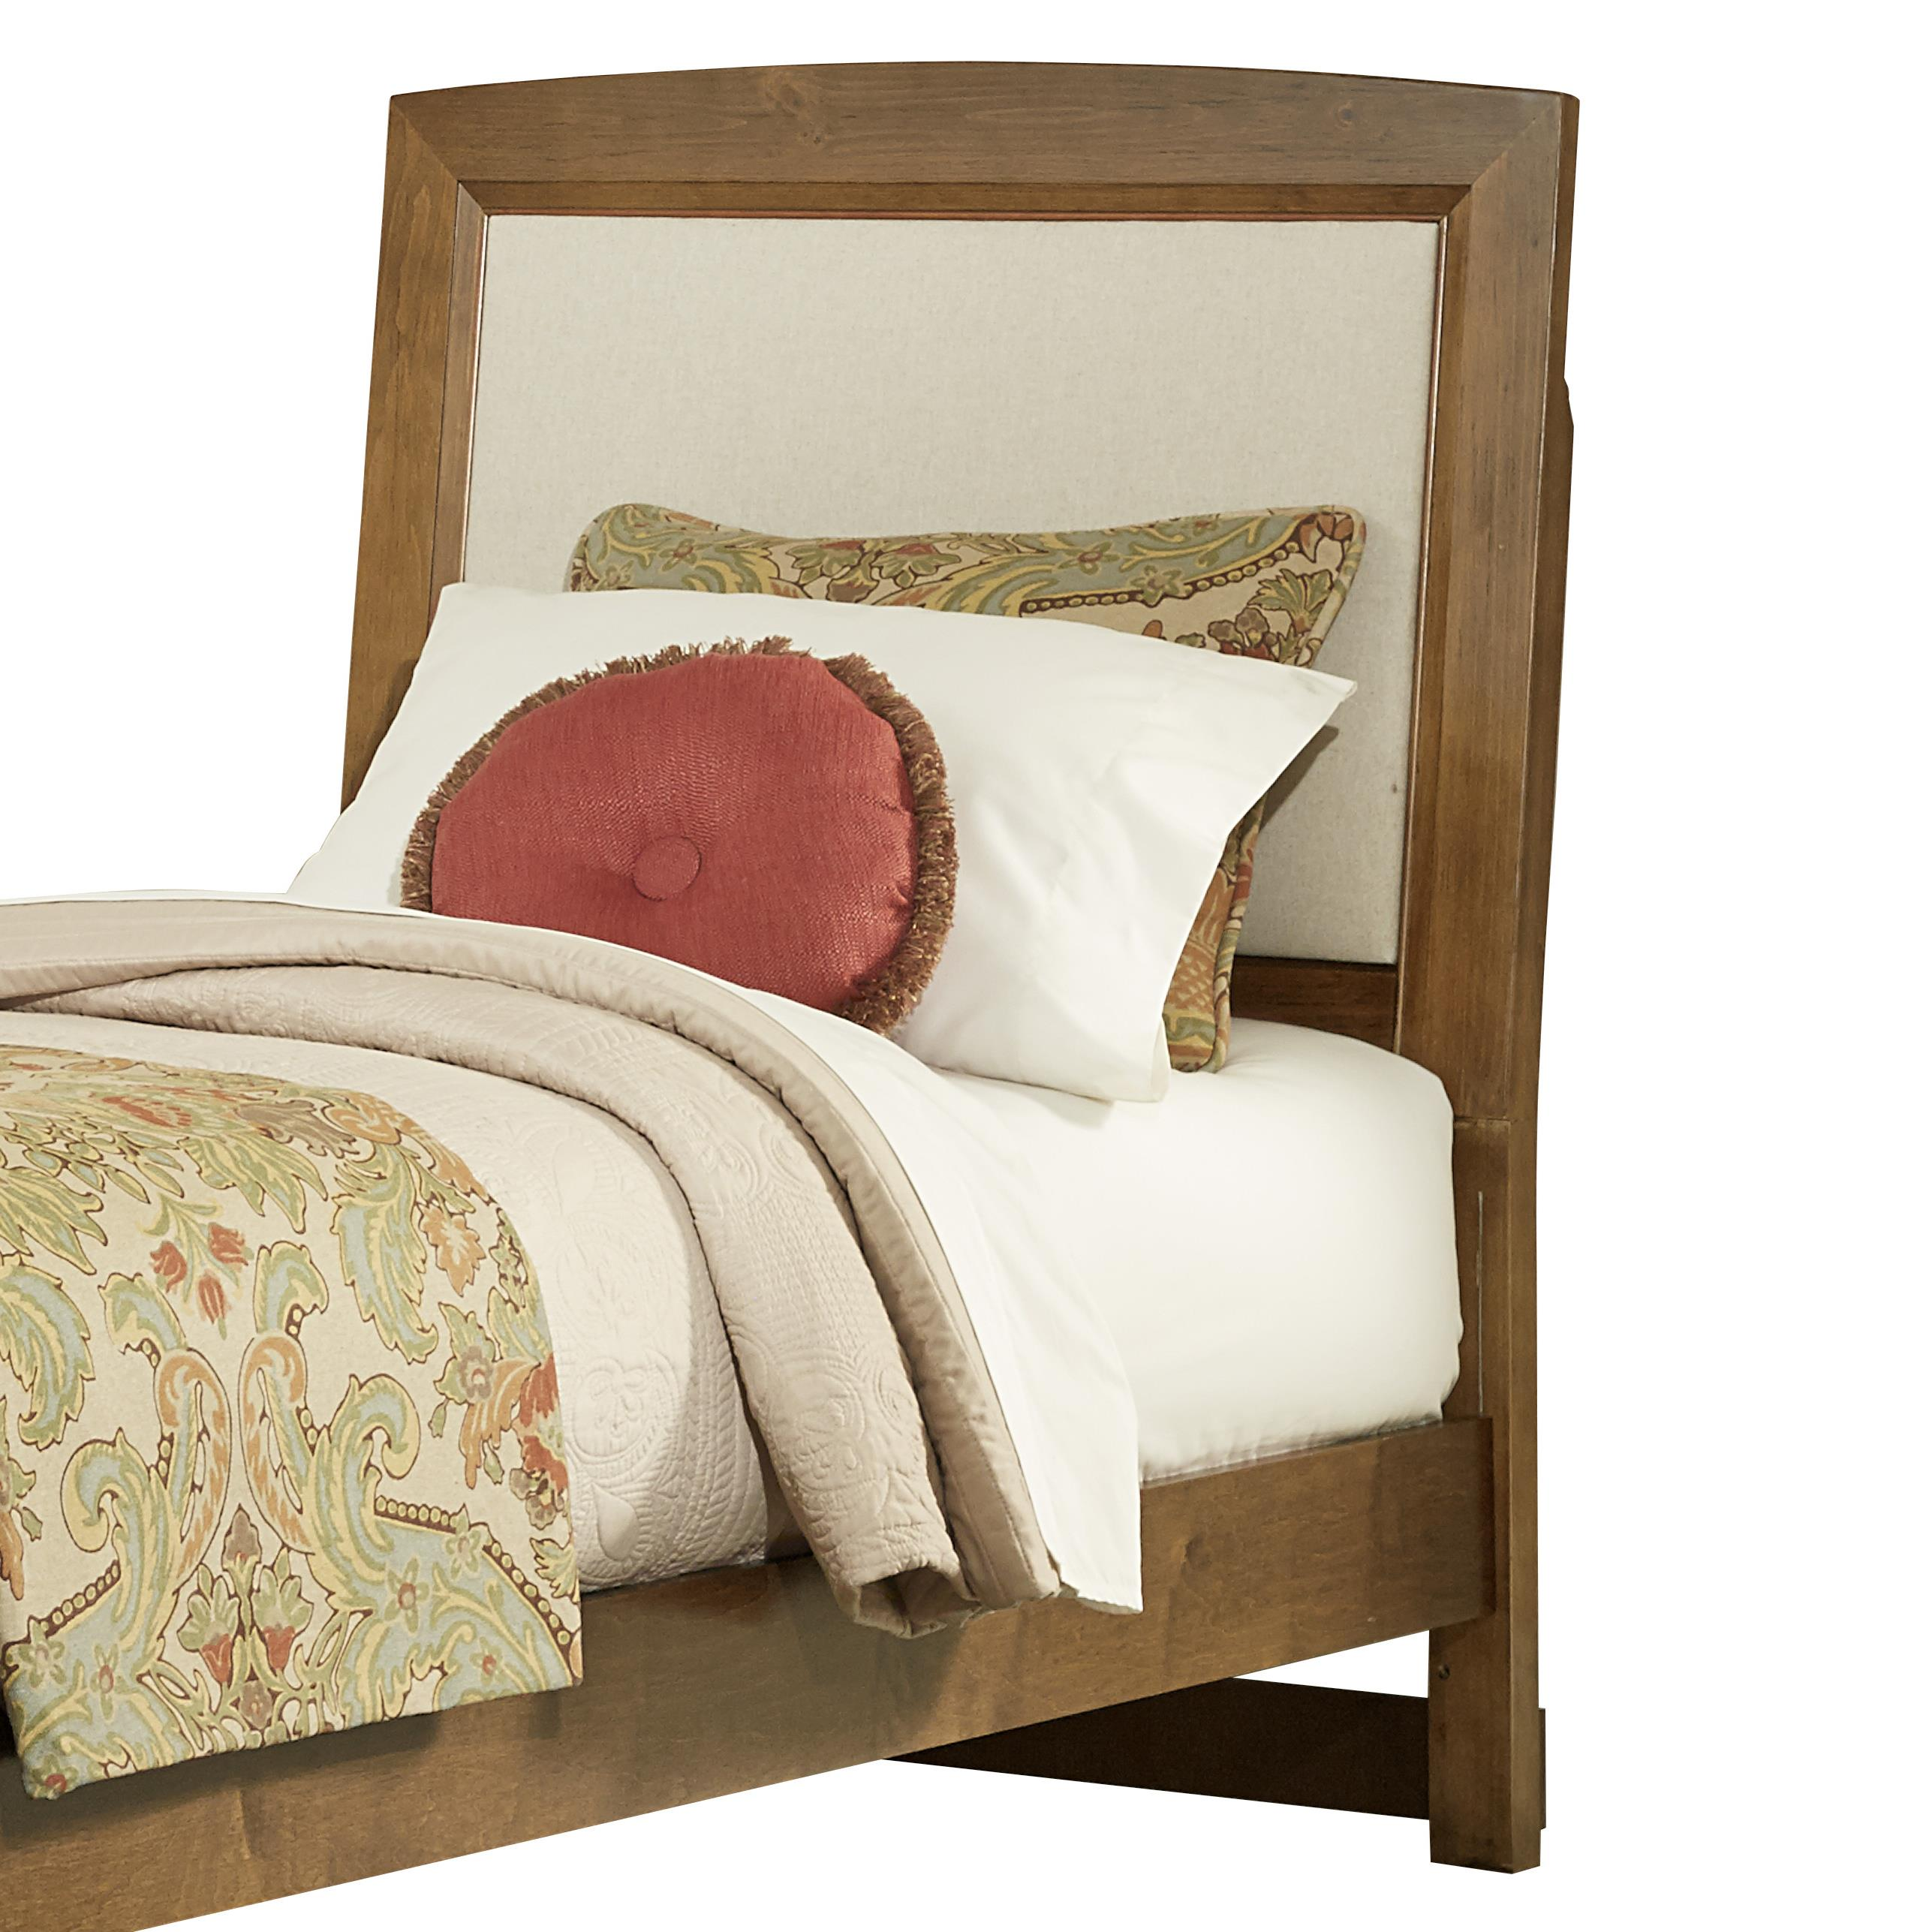 Twin Upholstered Headboard, Base Cloth Linen